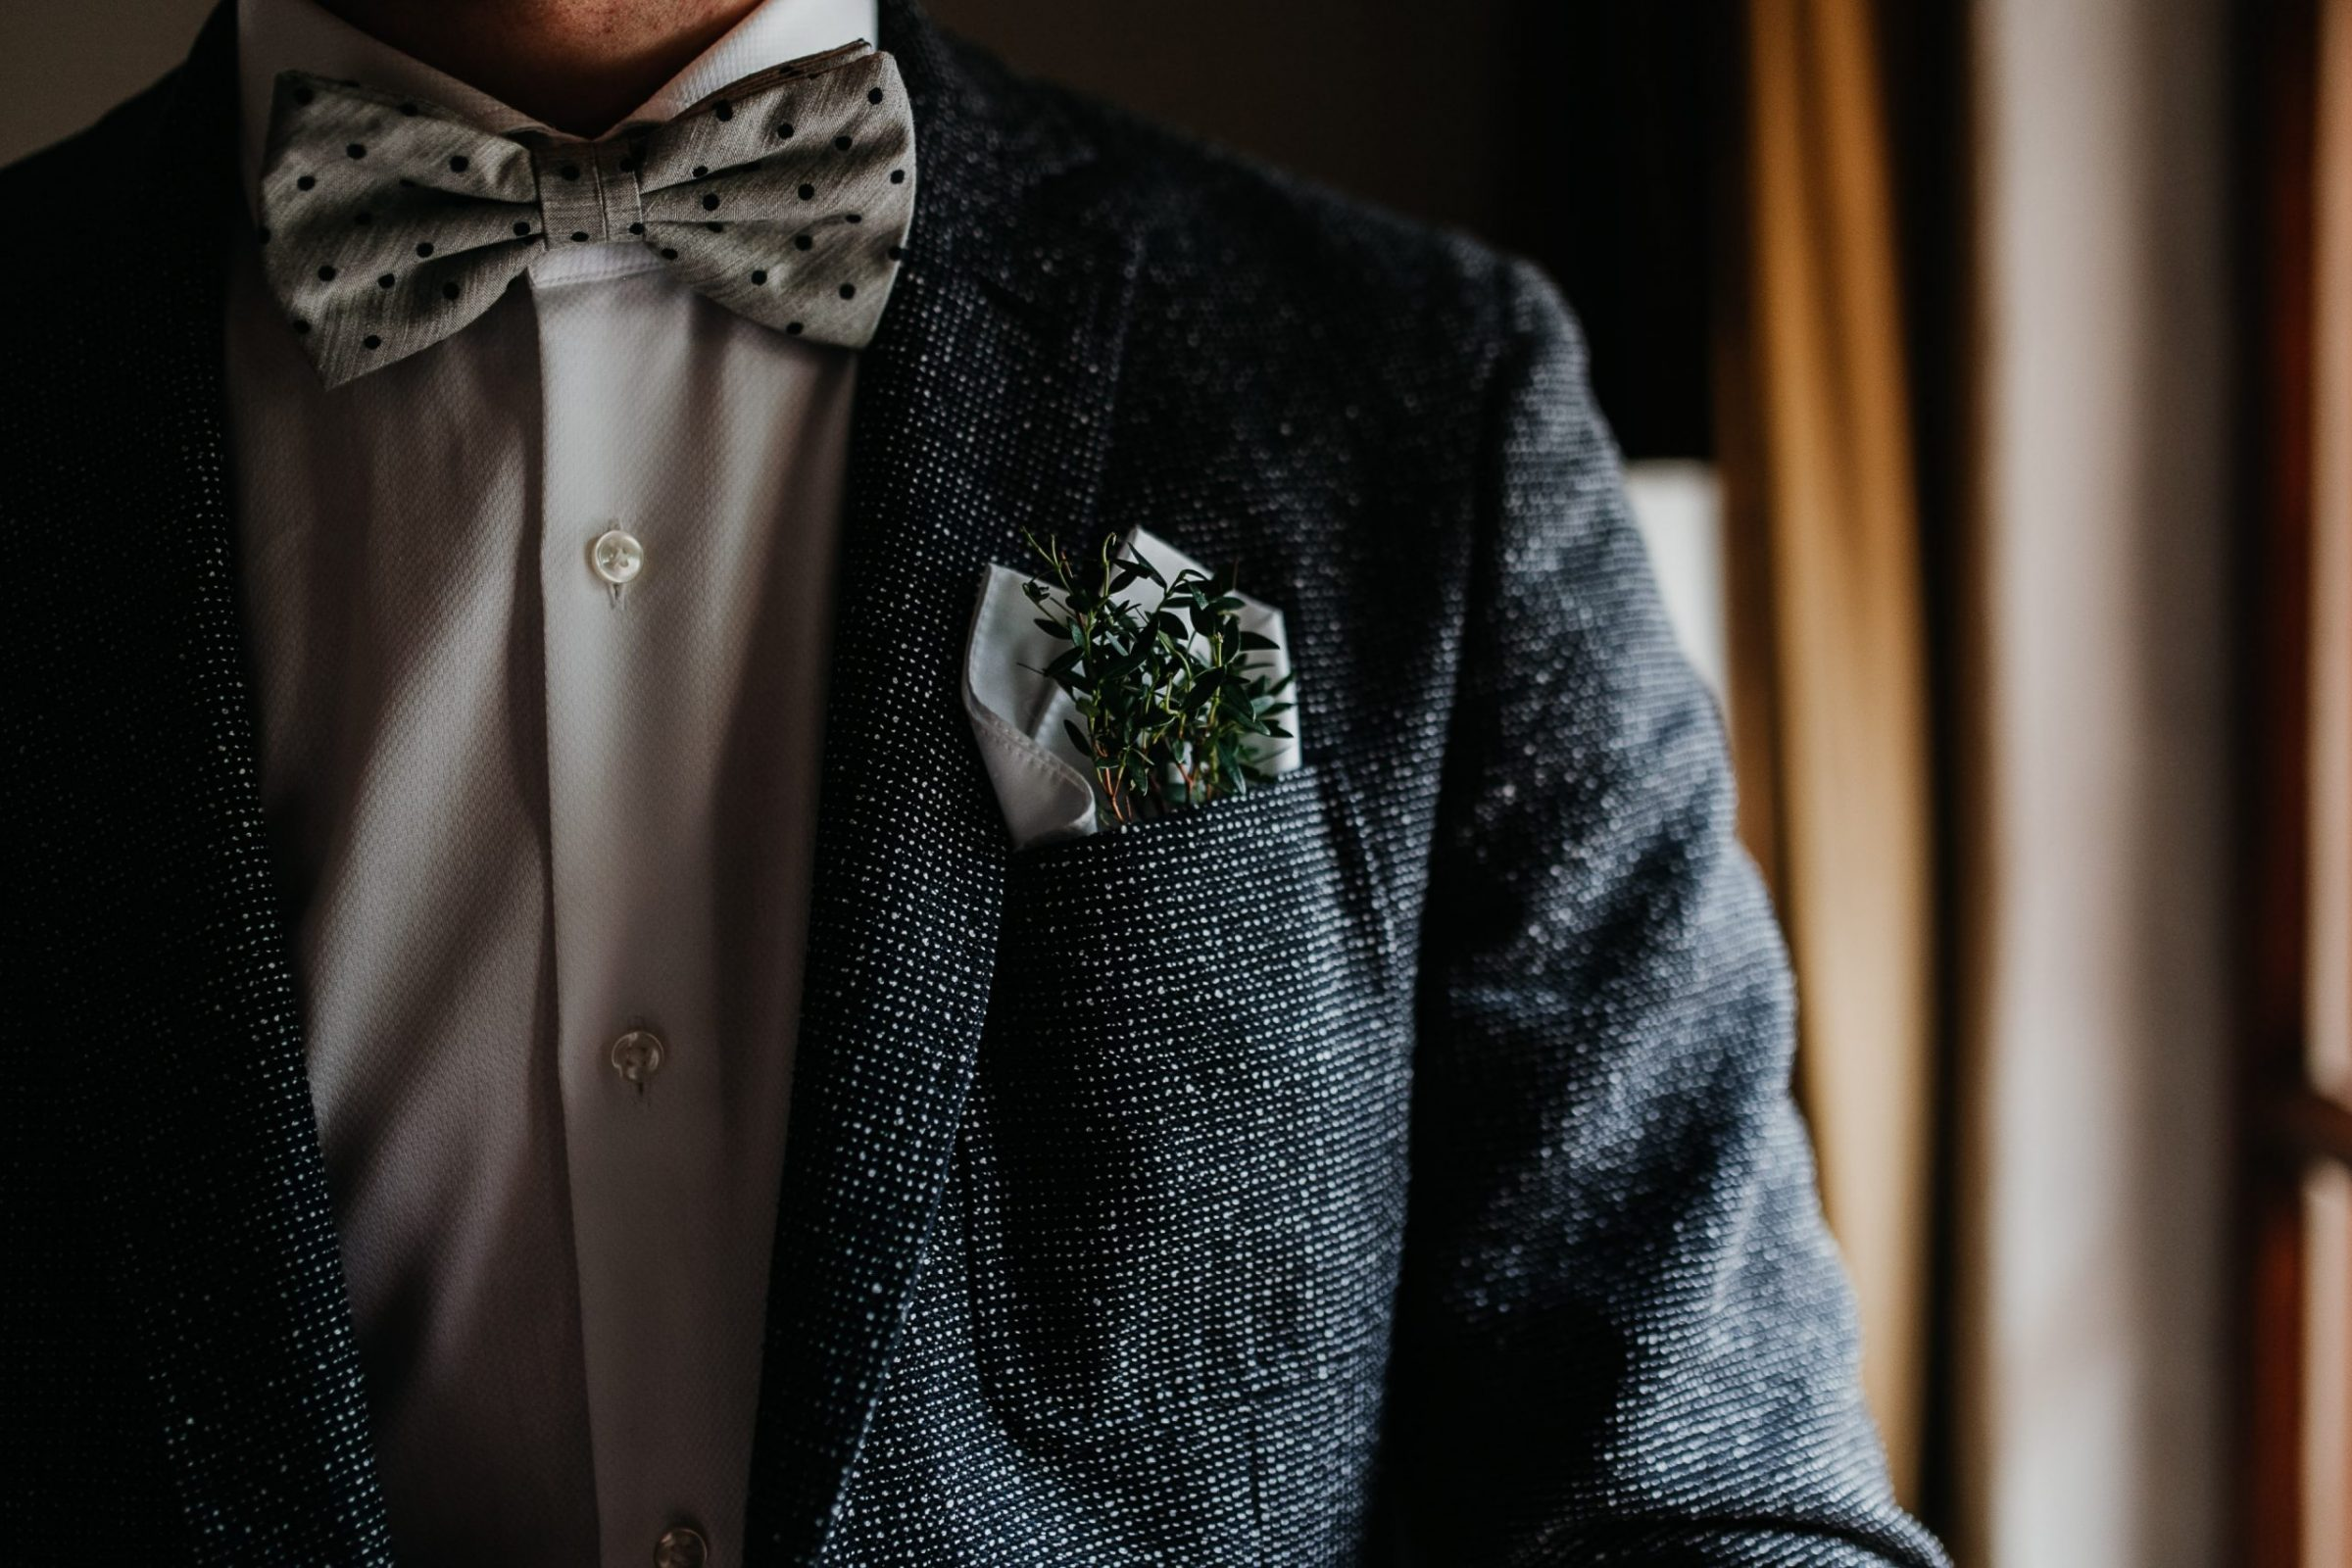 getting ready, groom getting ready, suit, bow tie, fliege, anzug, detailshot, detail